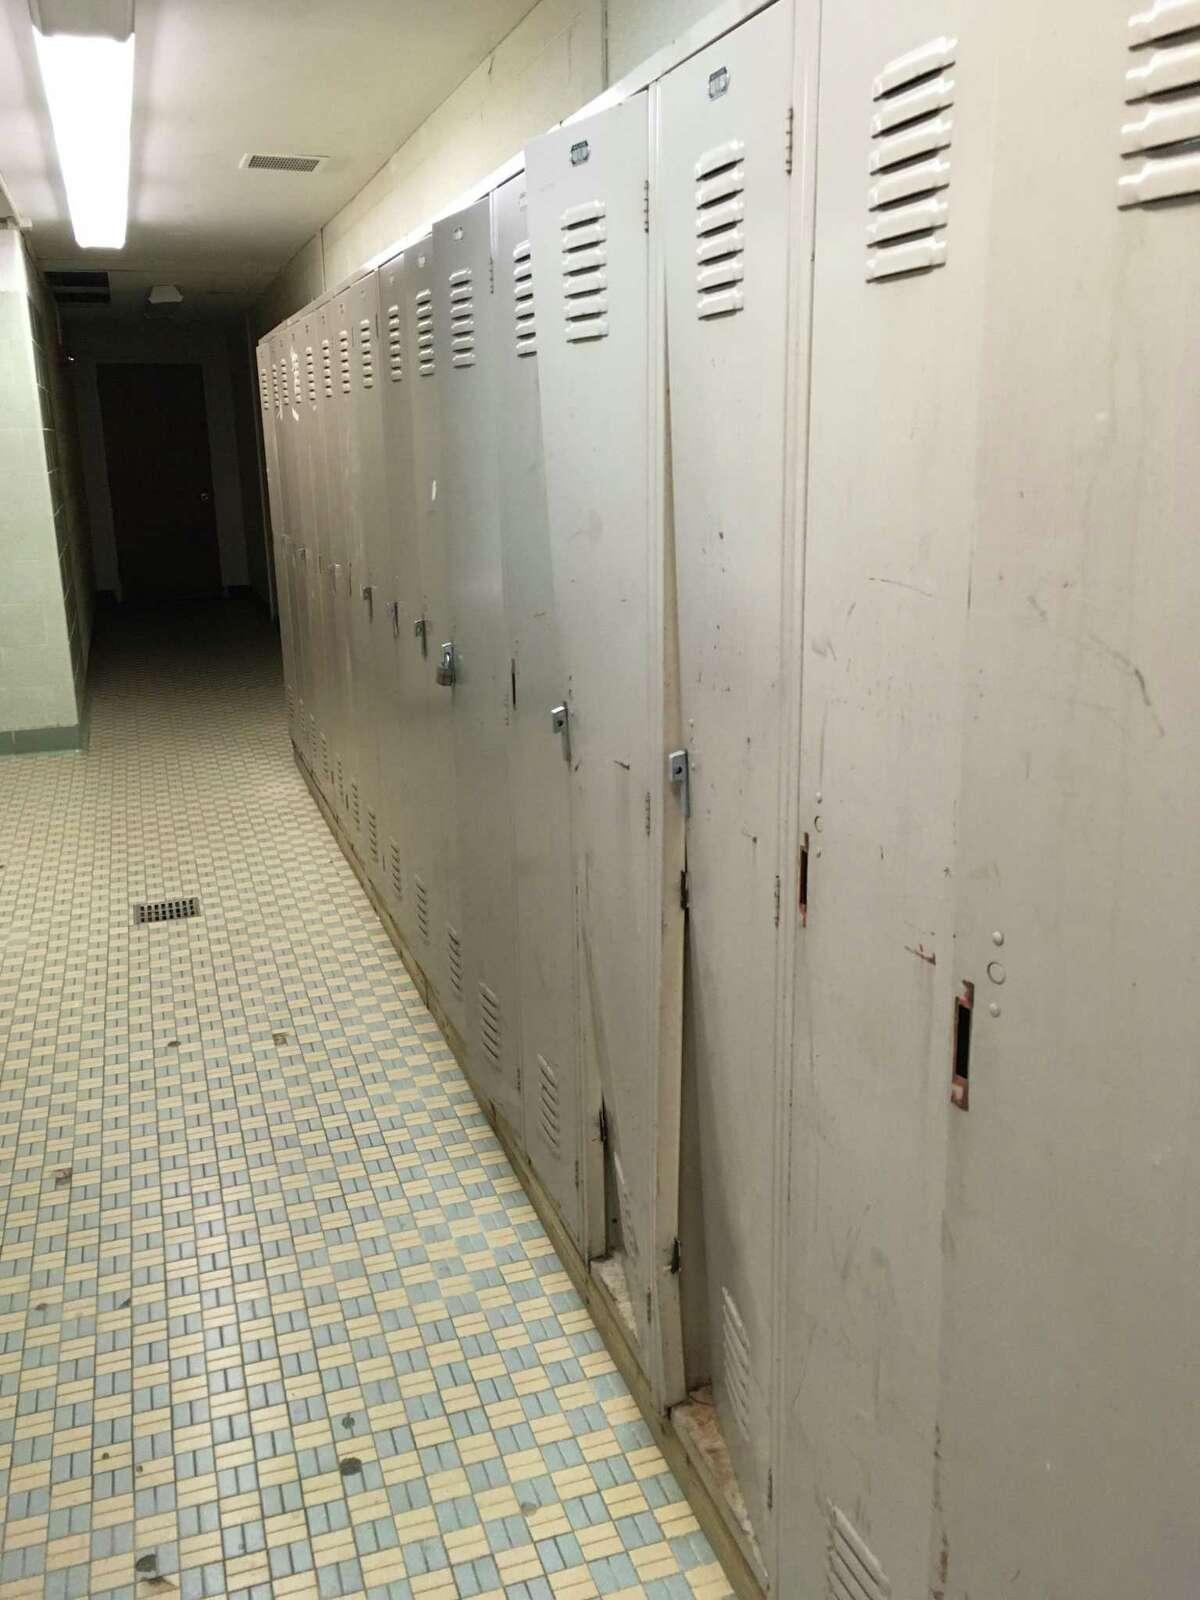 The boys' locker room in North Branford High School, Feb. 8, 2019.